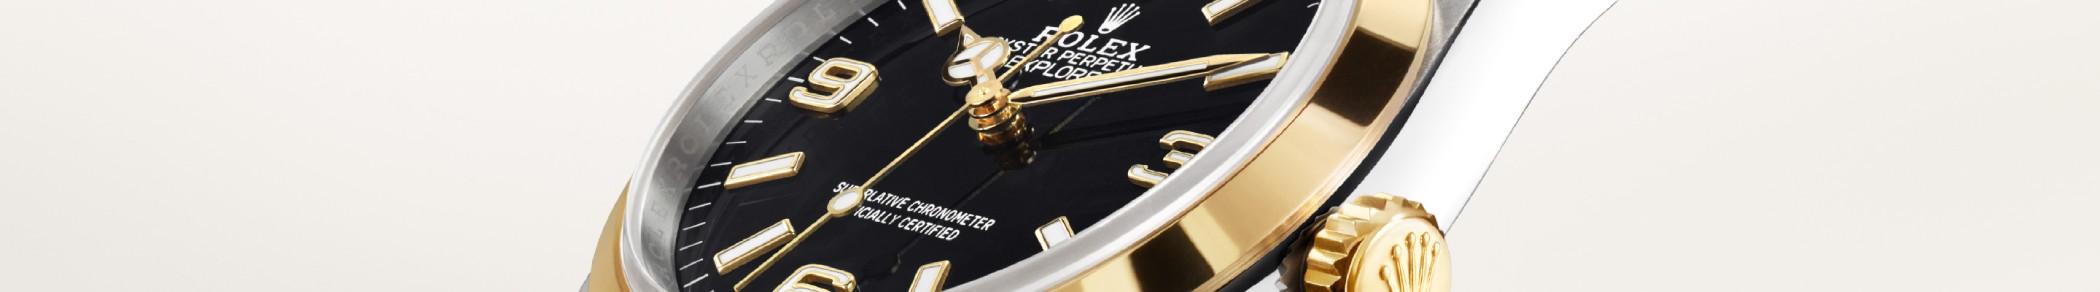 Rolex nowe zegarki 2021